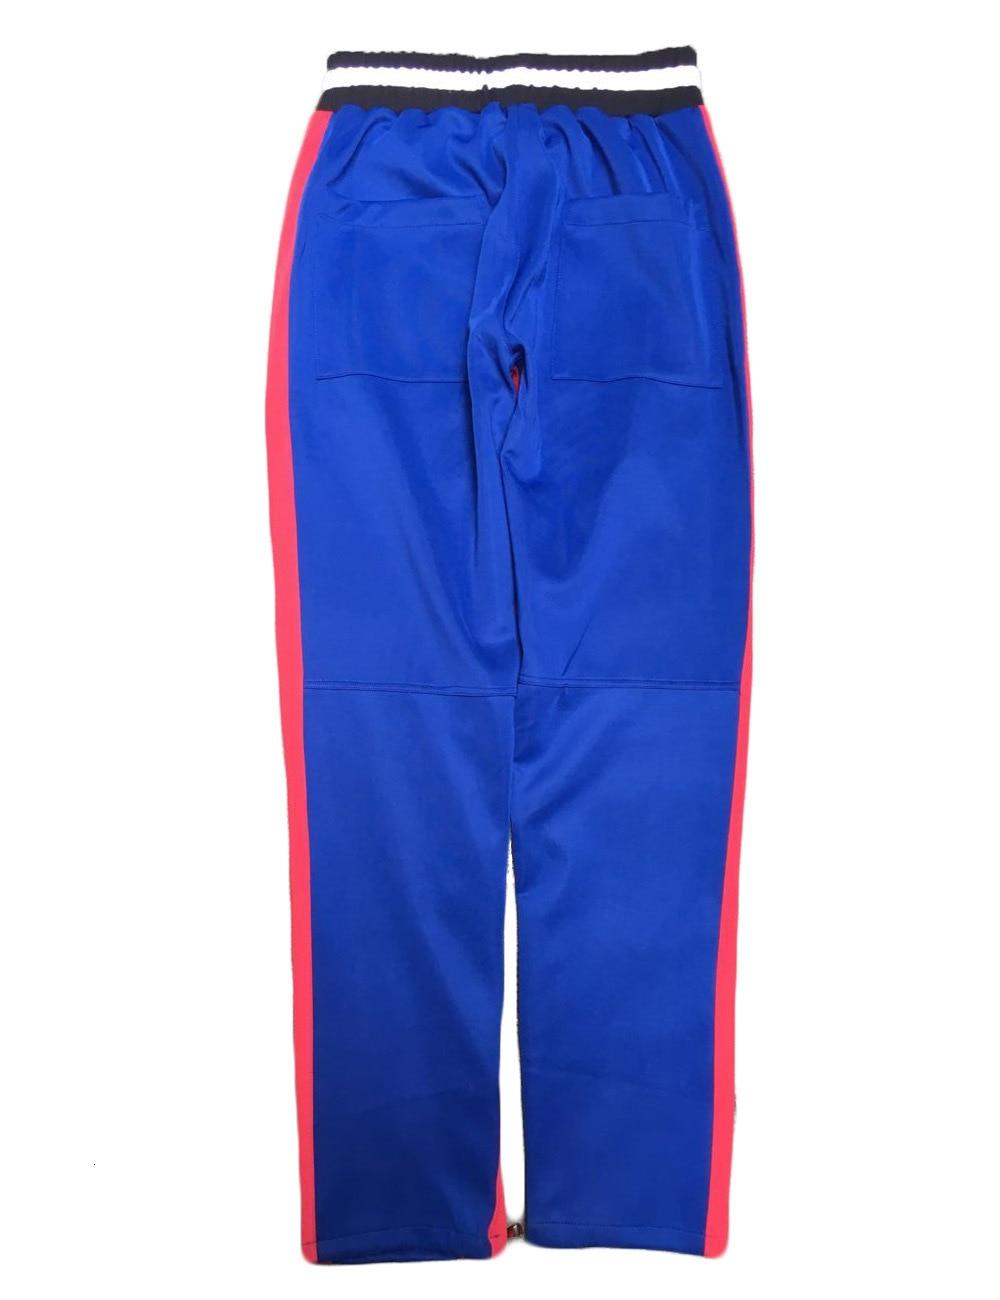 H.A. Sueno 2019 BIG SALE Men Track Pants Hip Hop Men's Pants With Zippers Popular Panelled Soft Trousers High Street Wear /7